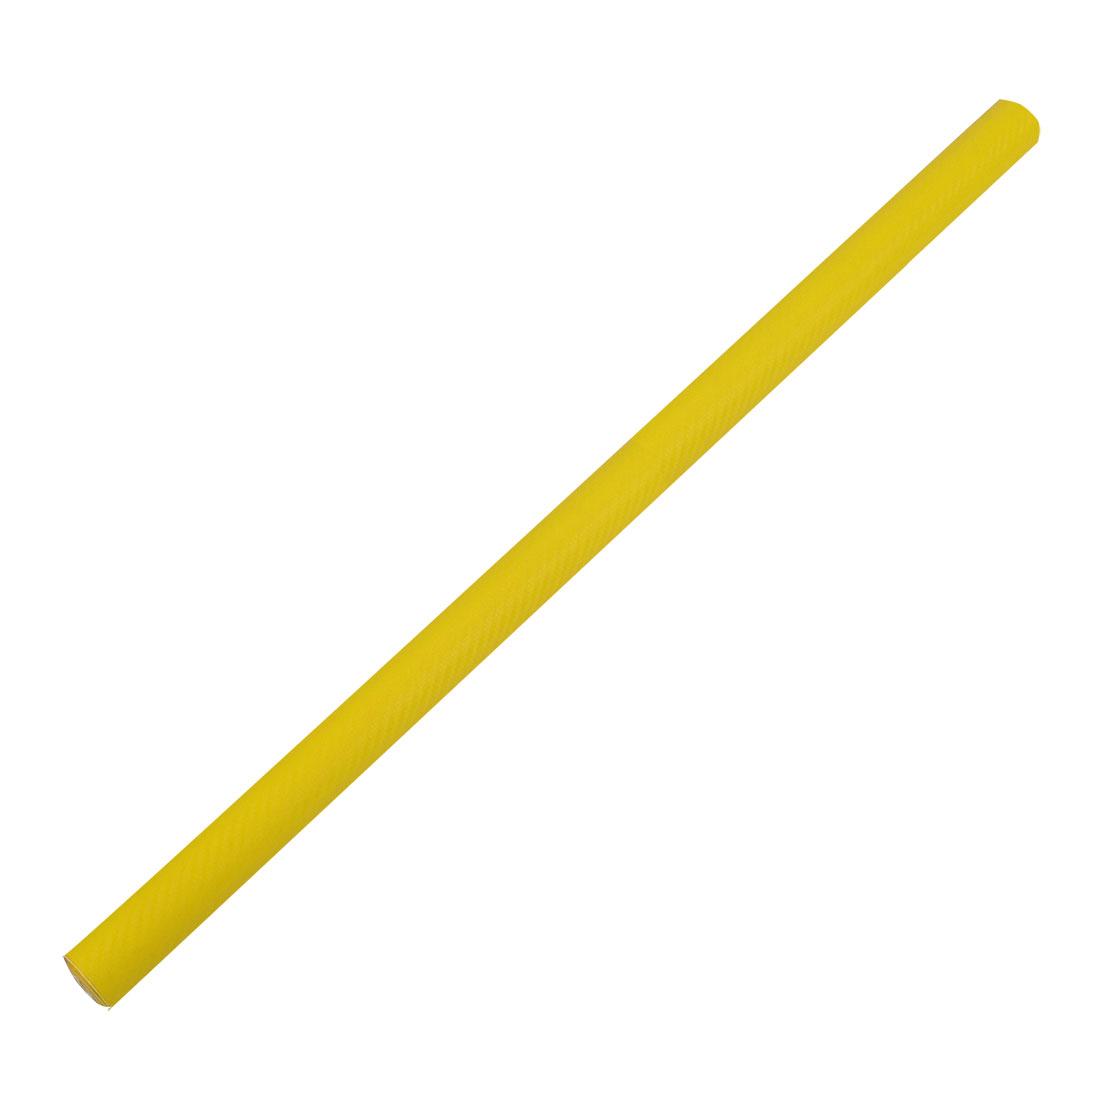 "3D Real Carbon Fiber Vinyl Wrap Sticker Roll Film Yellow 30"" x 59"" 5ft x 2.5ft"